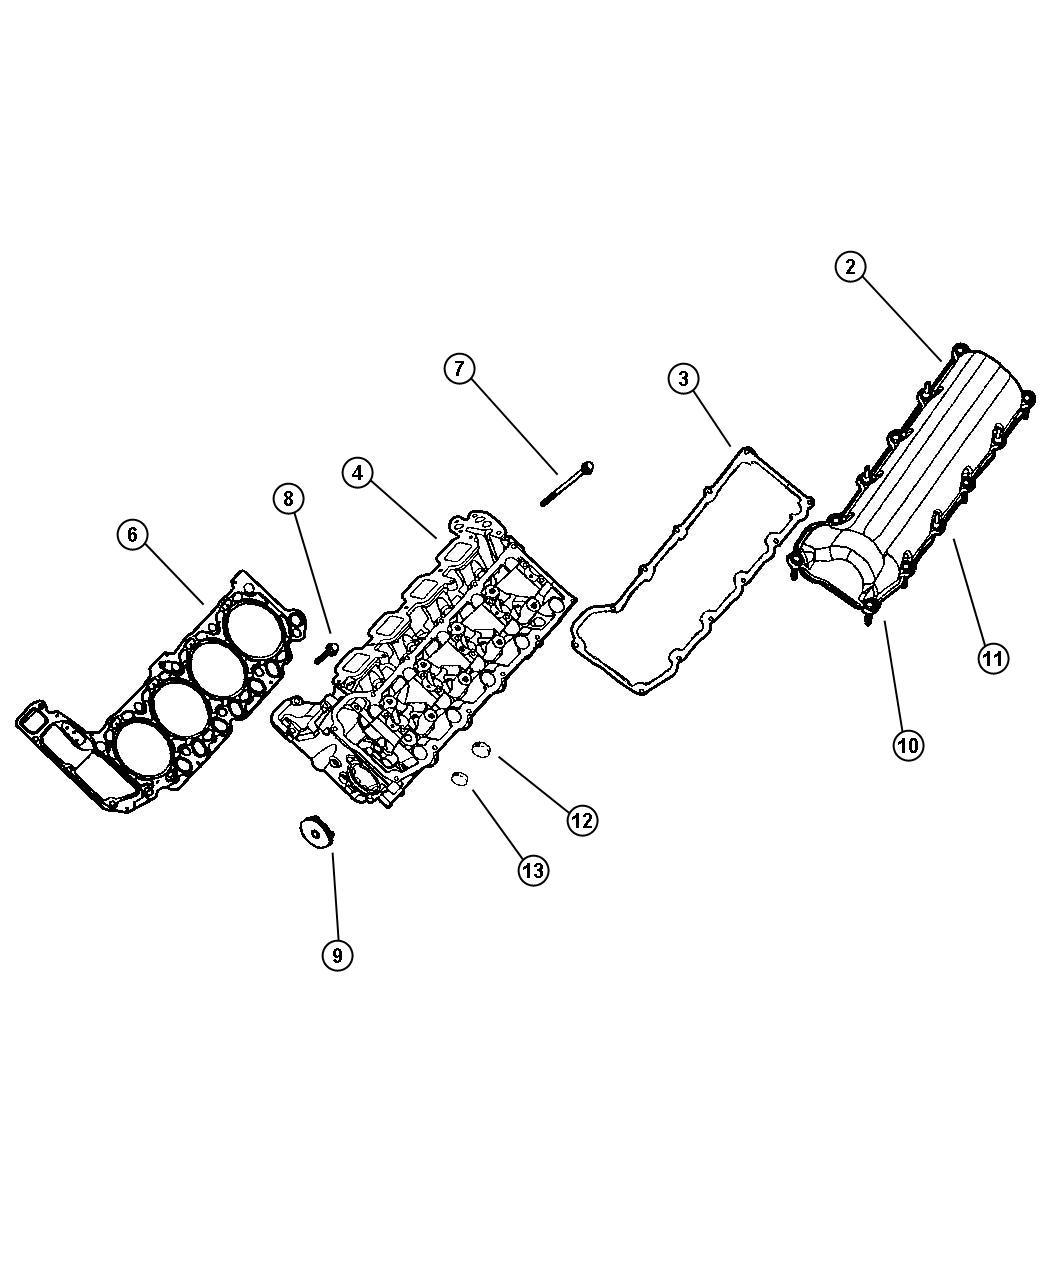 2006 Dodge Durango Cylinder Head, 4.7 [EVA] [EVD]